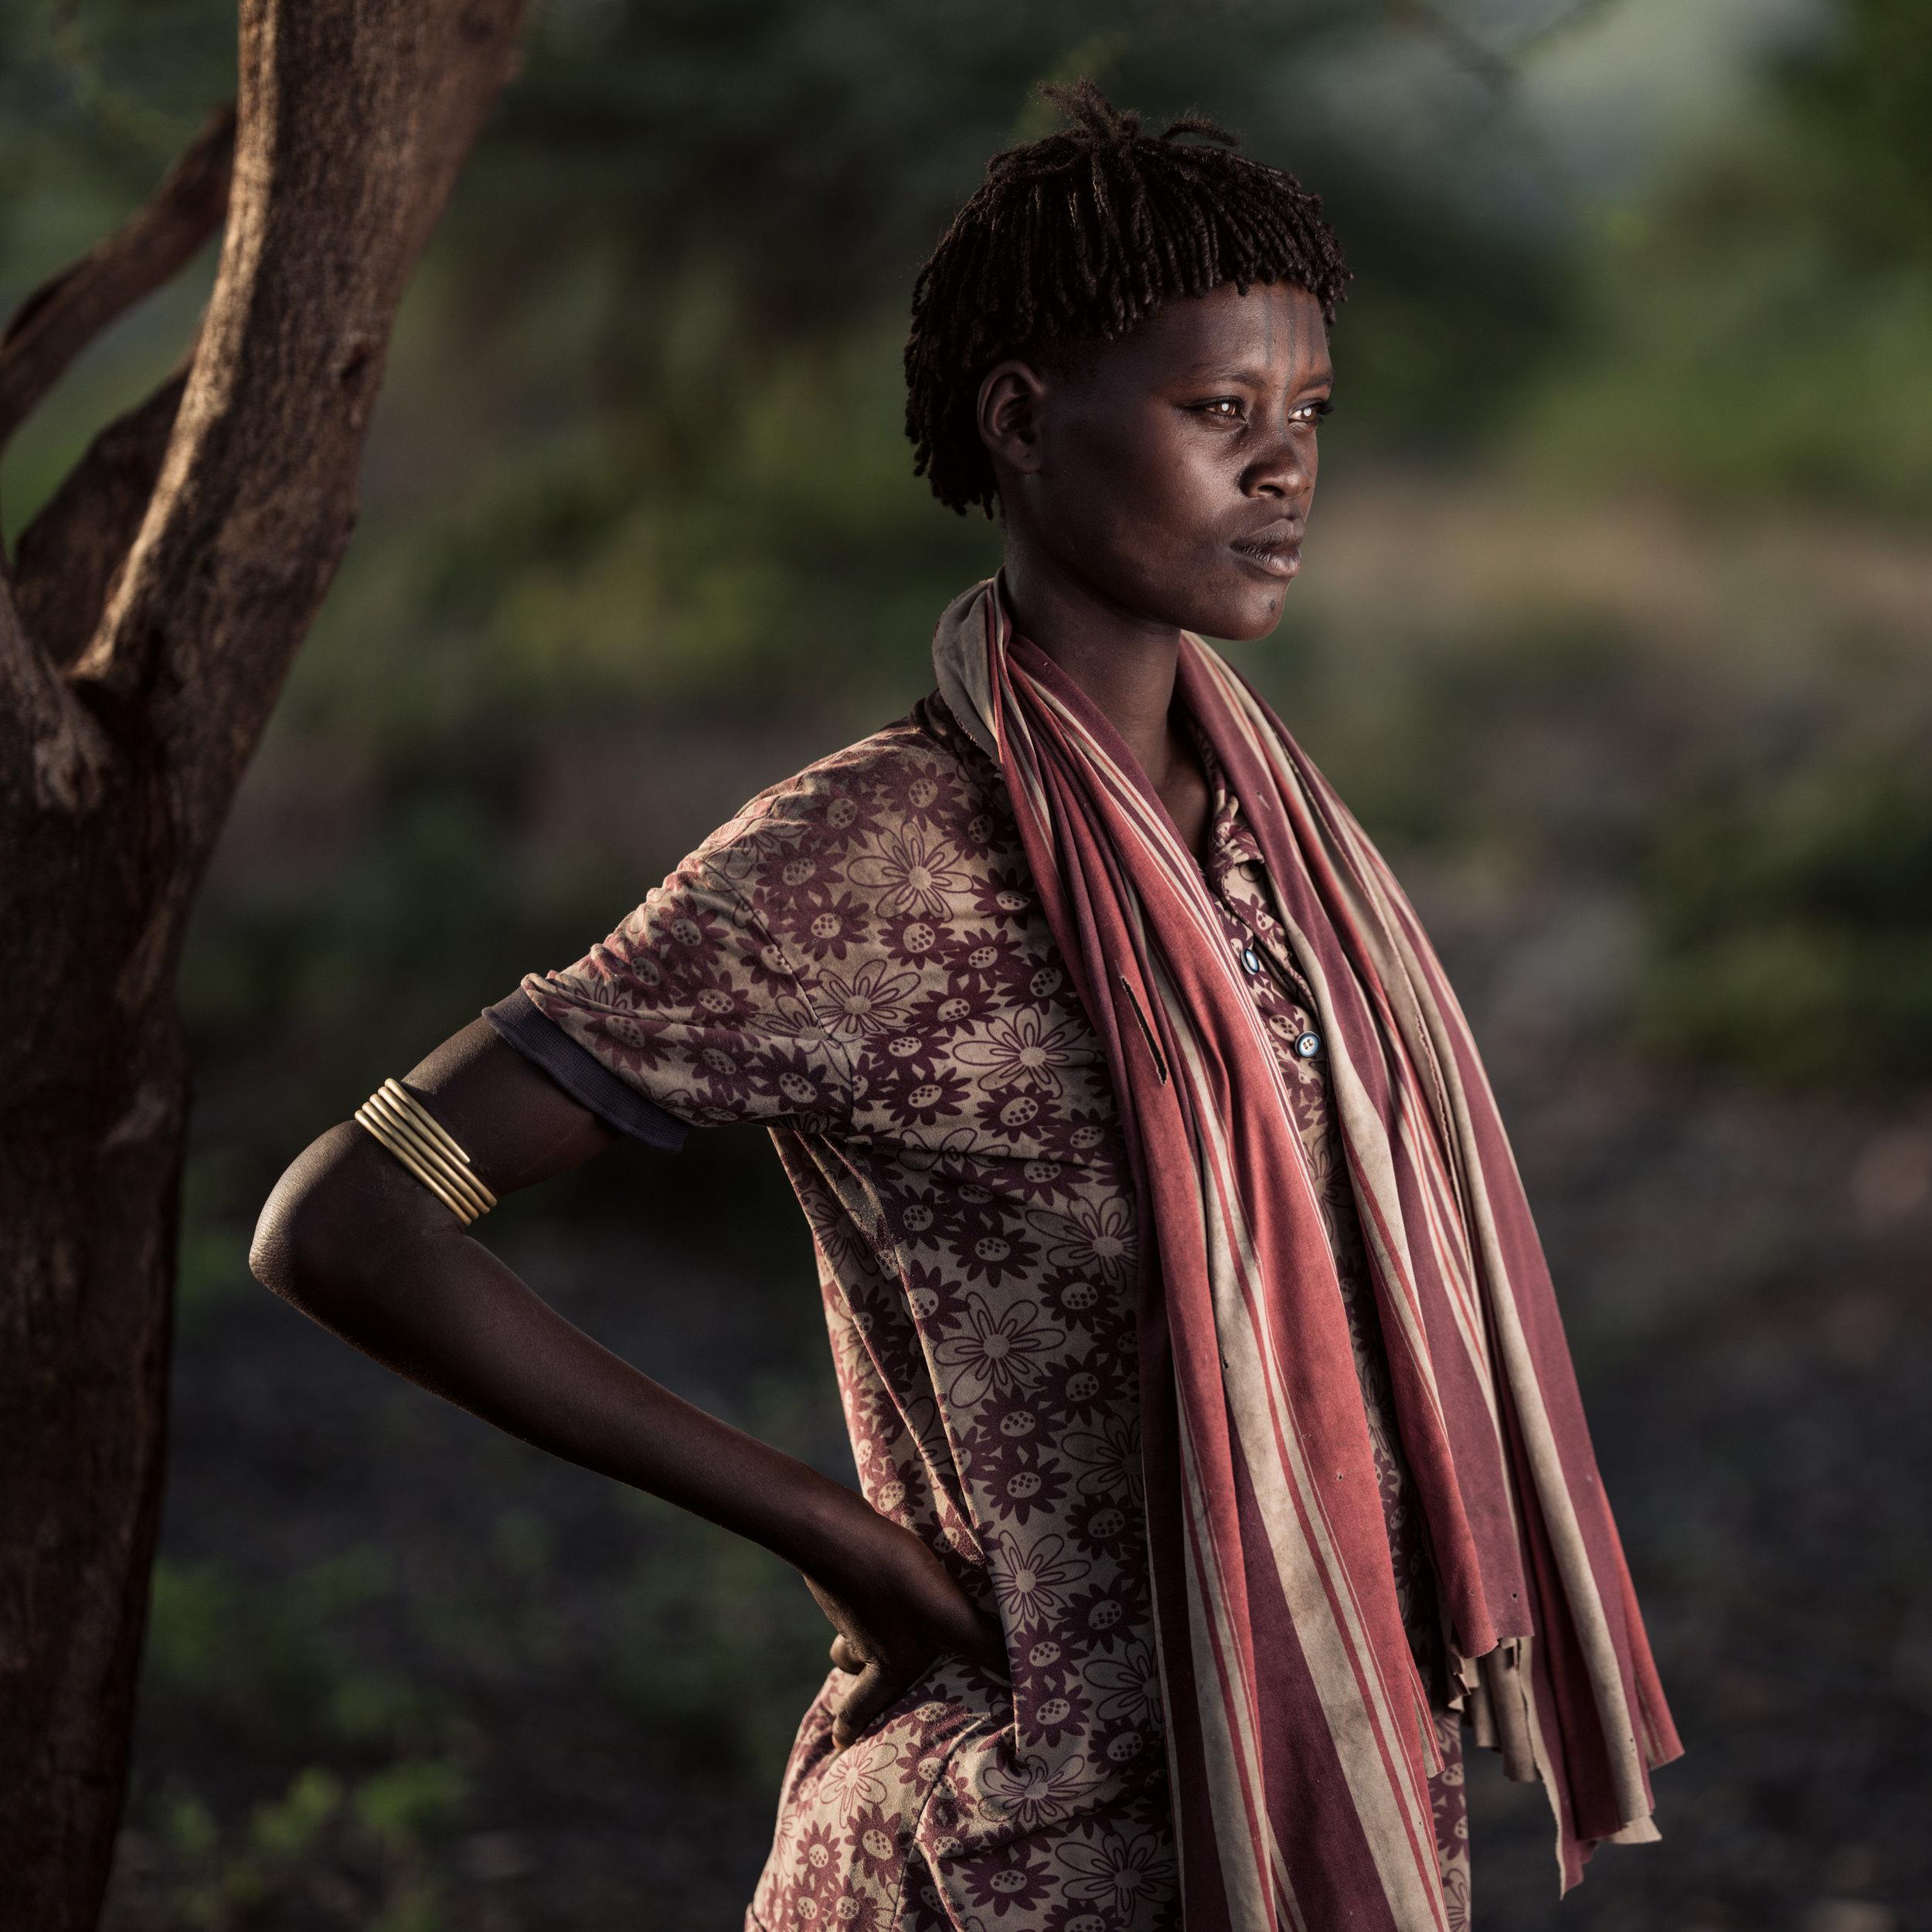 Ethiopia-Starling-PietVandenEynde_012.jpg